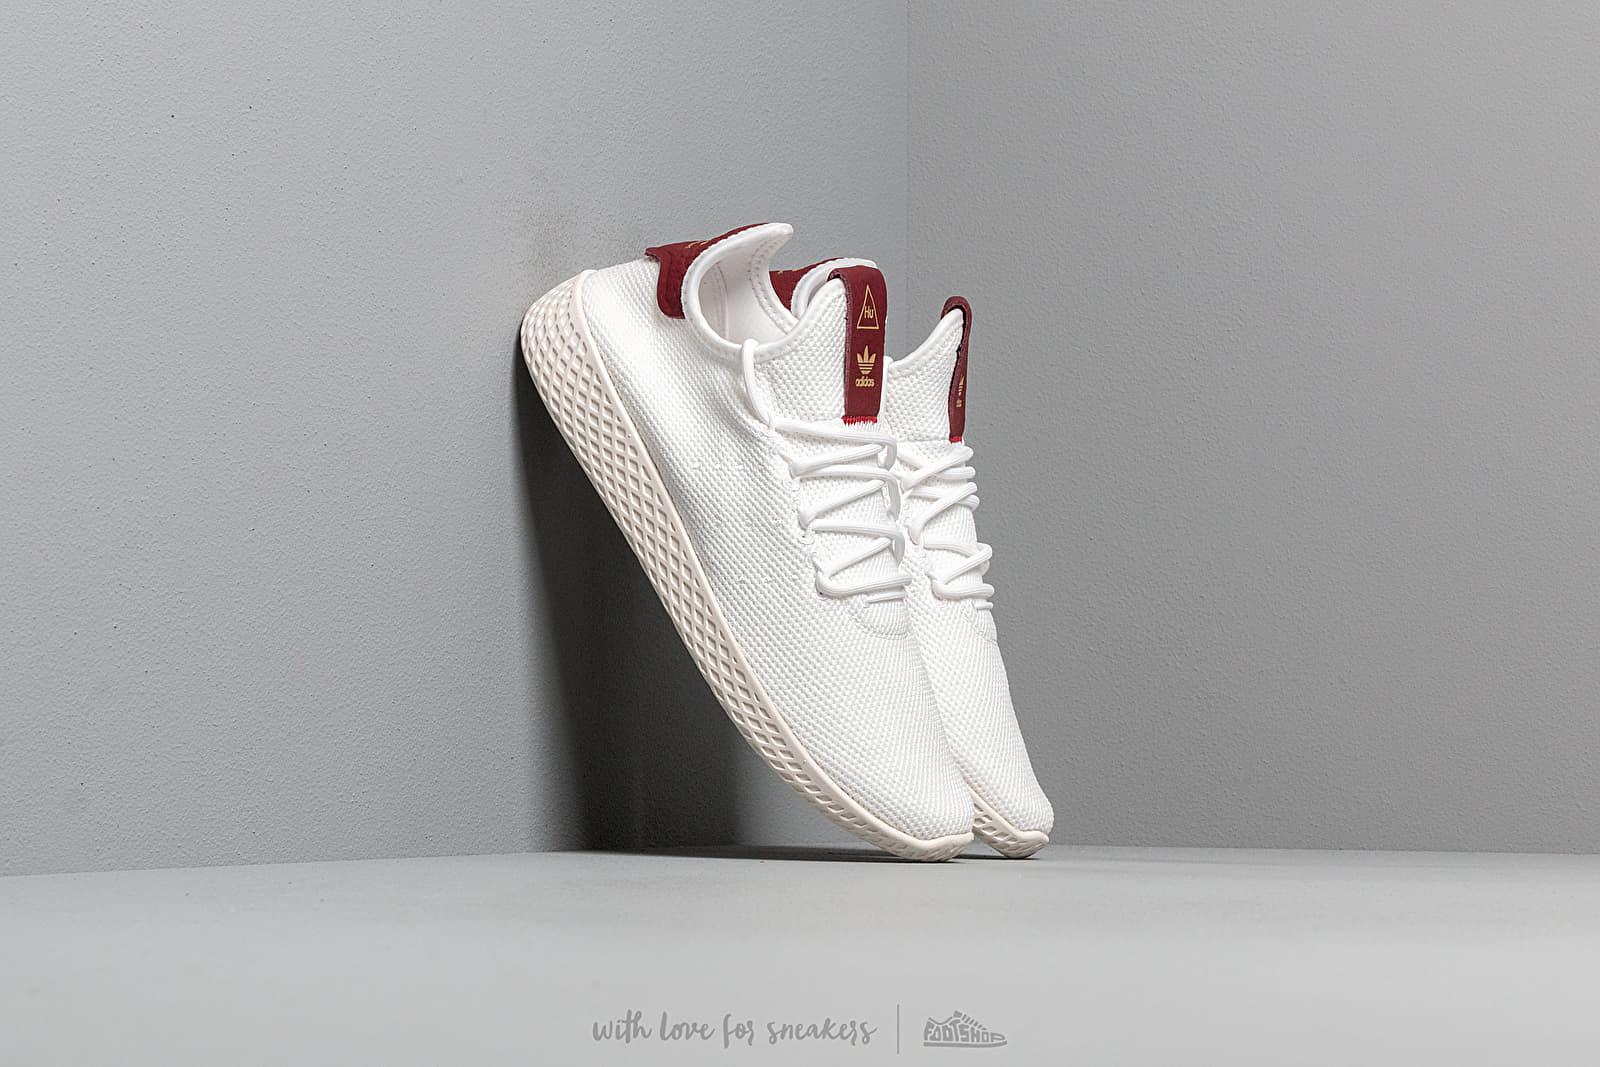 adidas Pw Tennis Hu W Ftw White/ Ftw White/ Core Burgundy za skvělou cenu 2 490 Kč koupíte na Footshop.cz